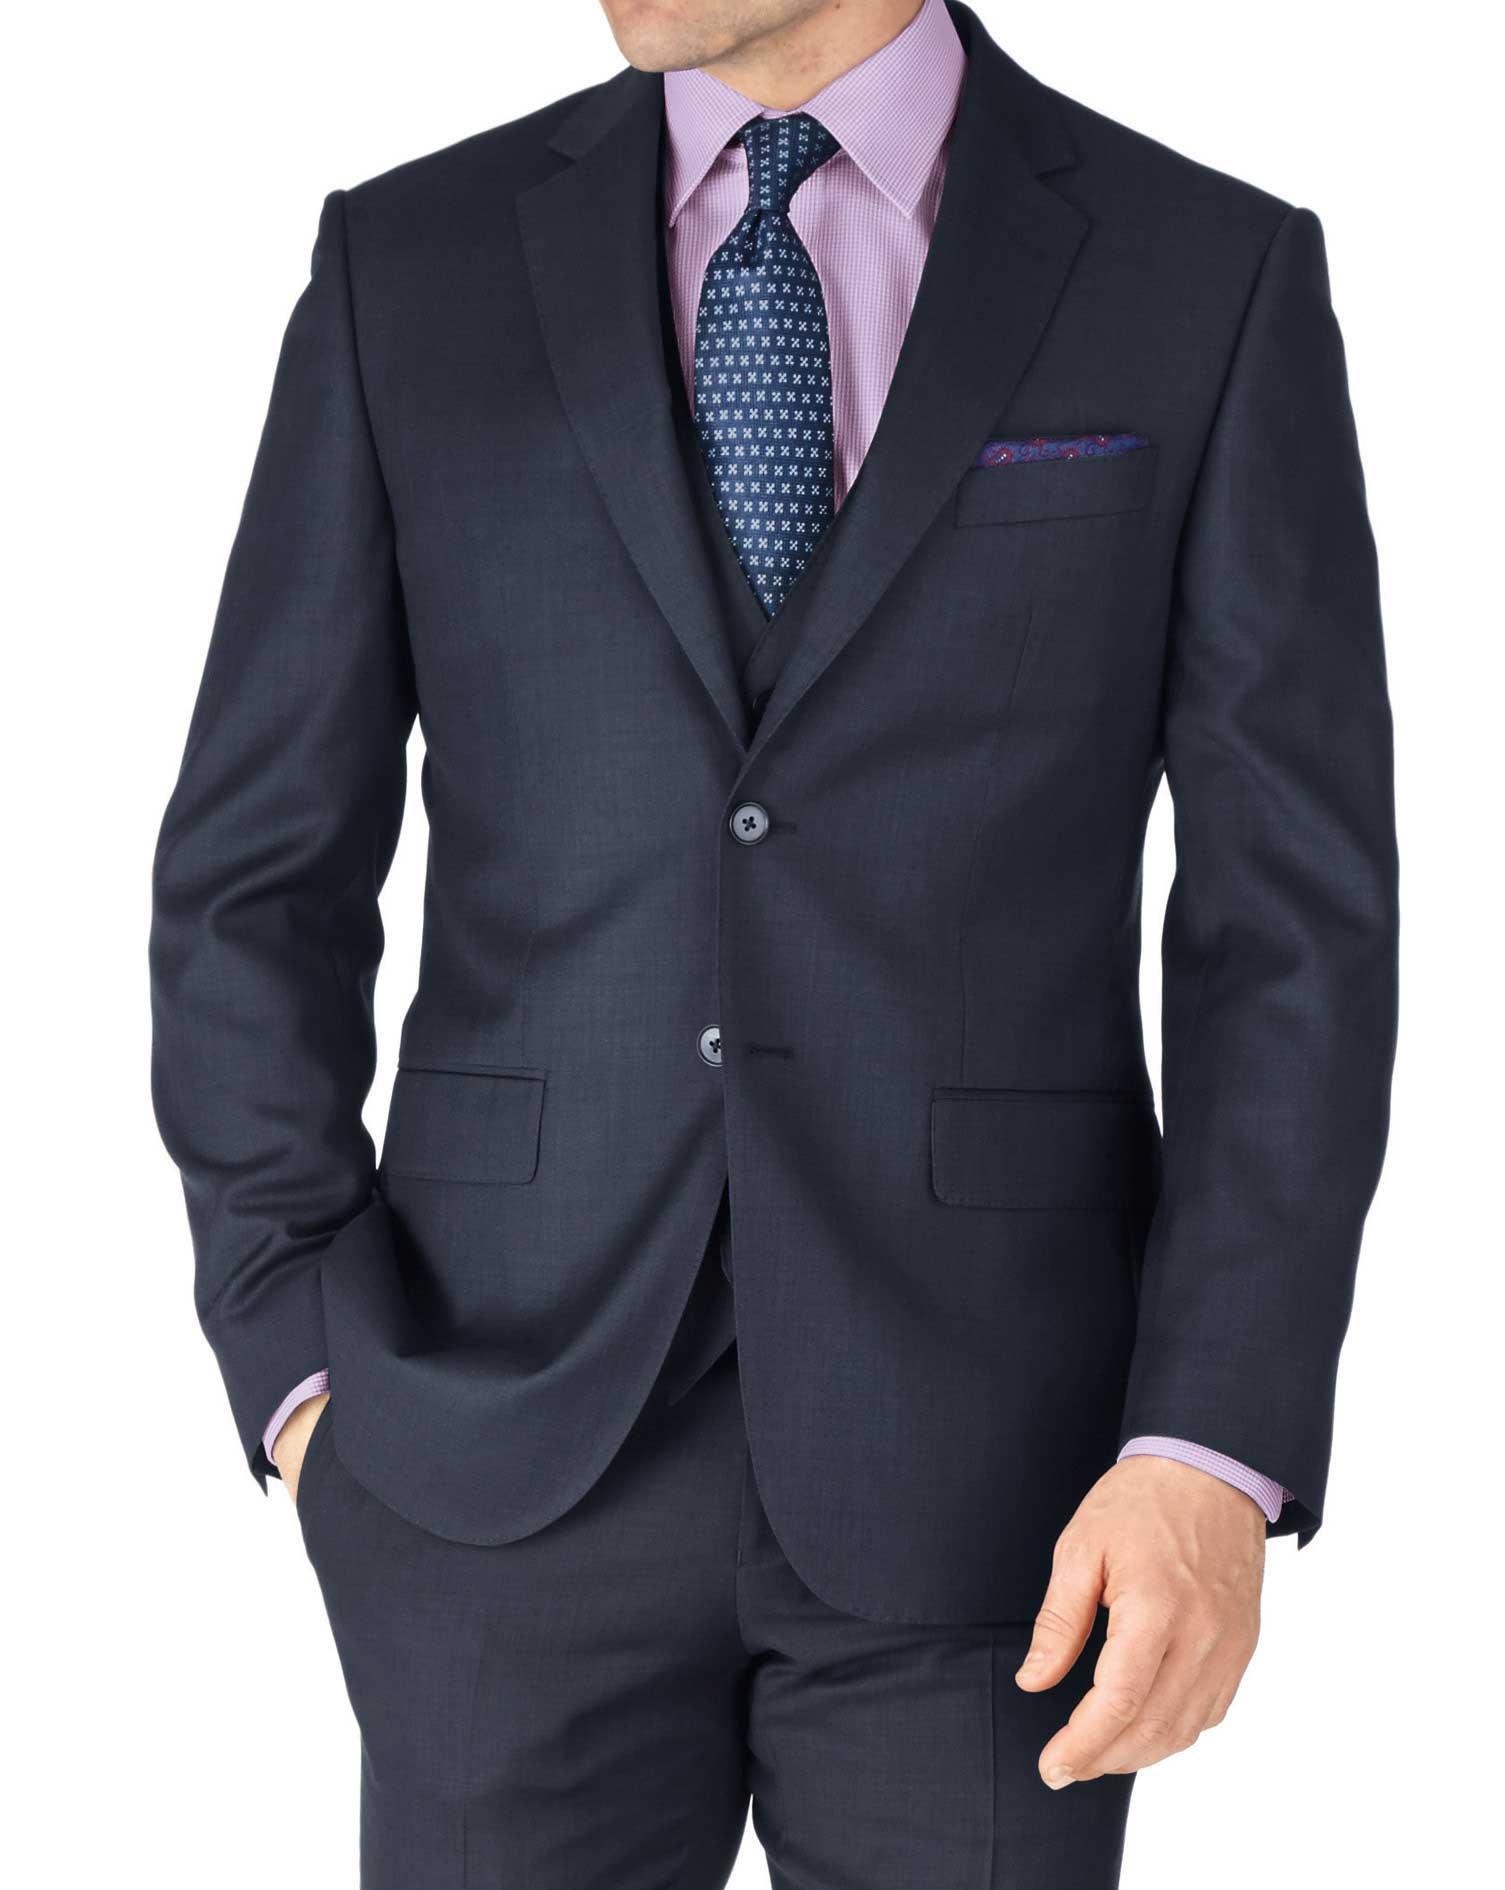 Blue Slim Fit Sharkskin Travel Suit Wool Jacket Size 38 Long by Charles Tyrwhitt